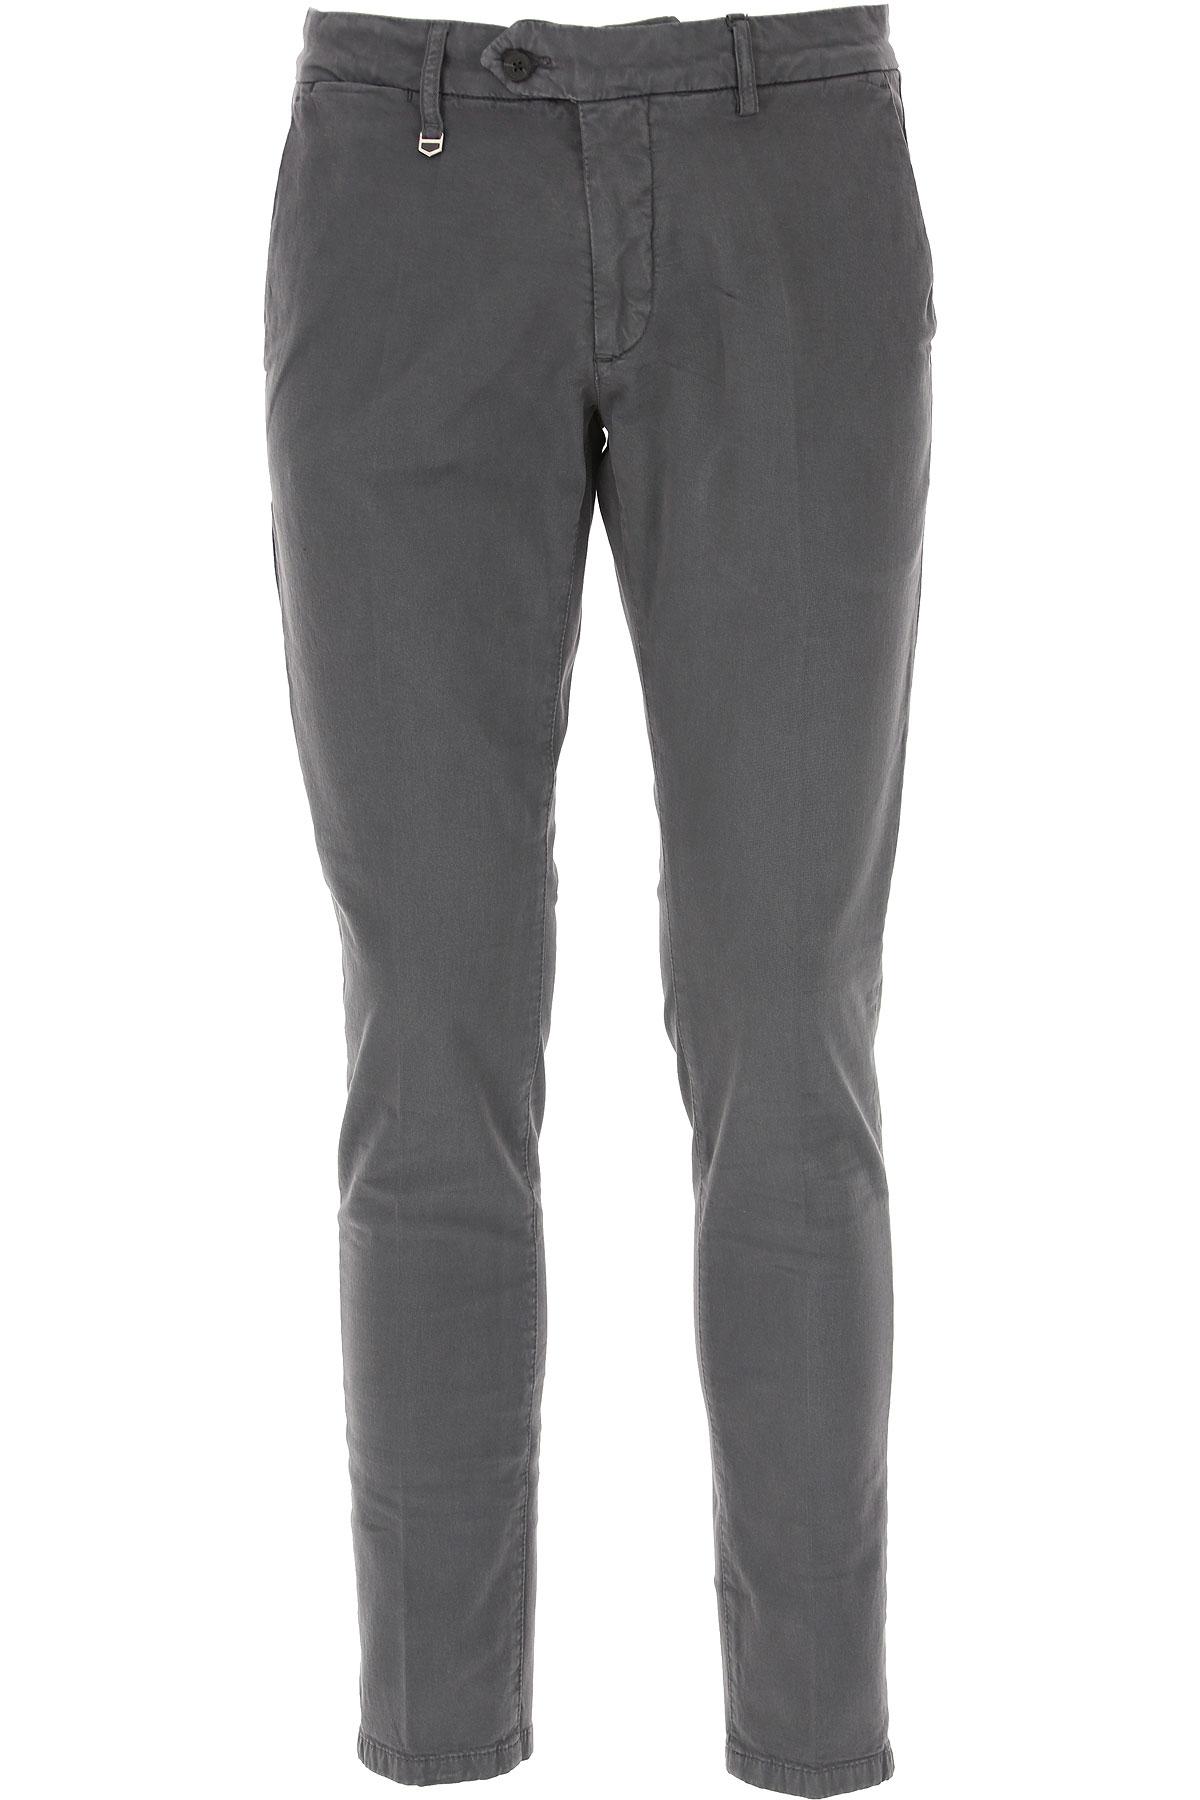 Antony Morato Pants for Men On Sale, Grey, Cotton, 2019, 34 36